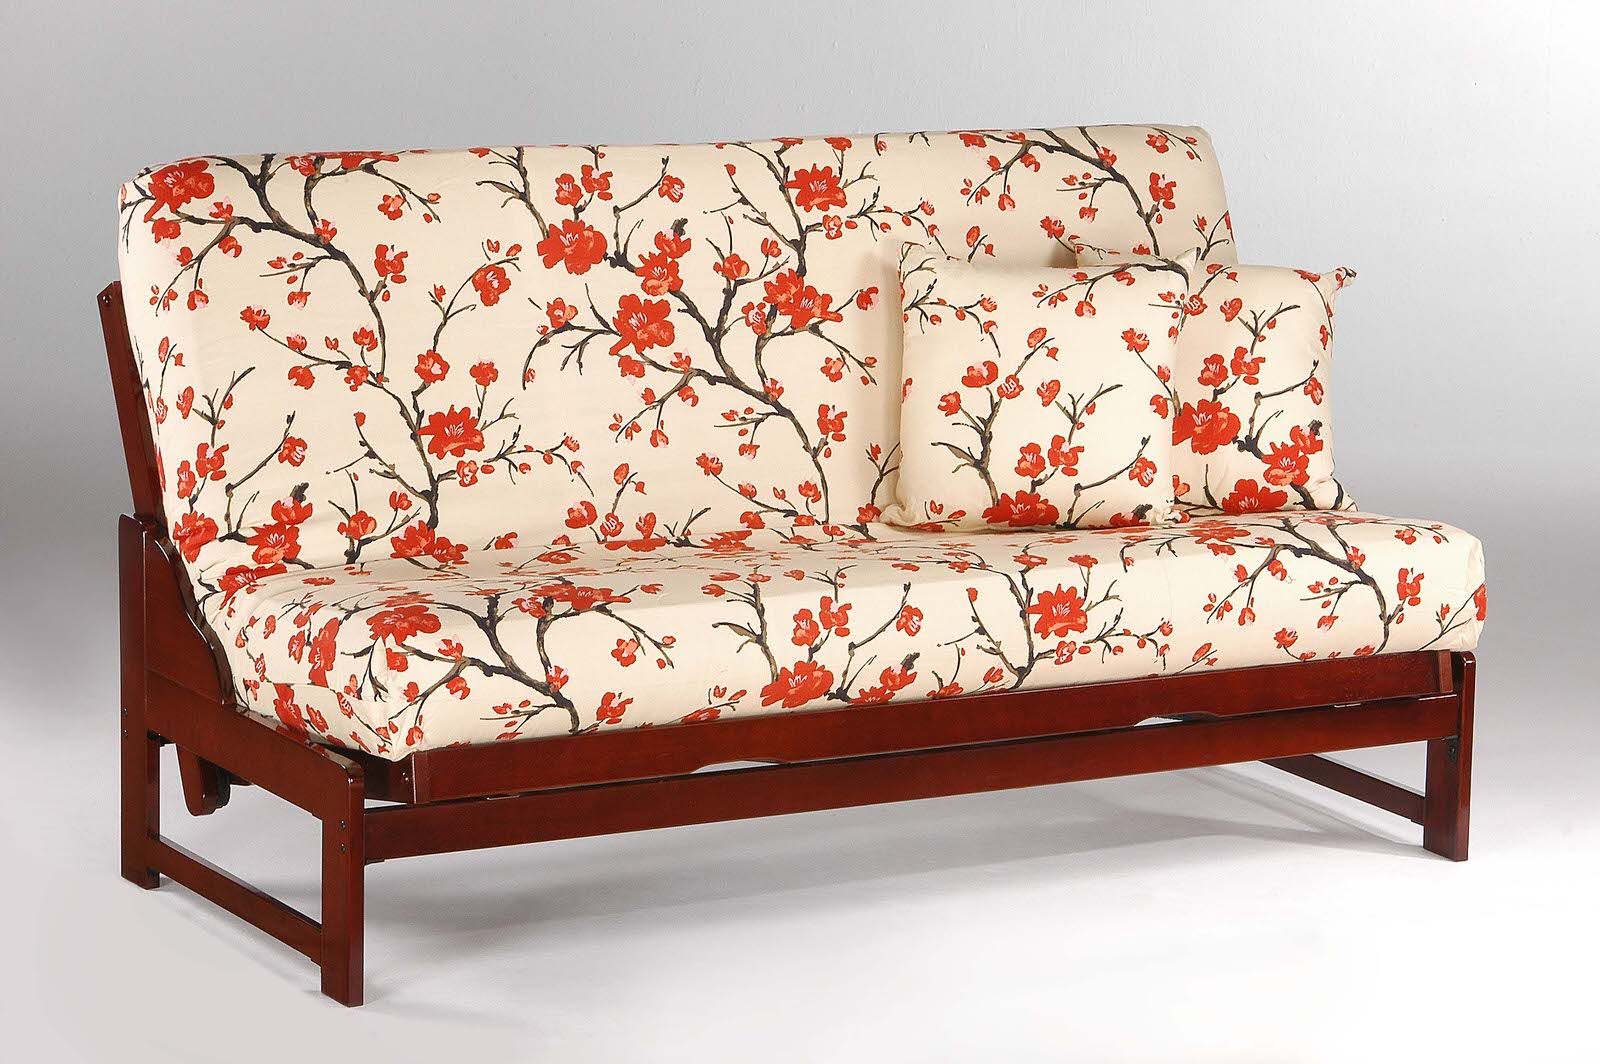 Famous Eureka Standard Futon Frame by Night&Day Furniture HV11